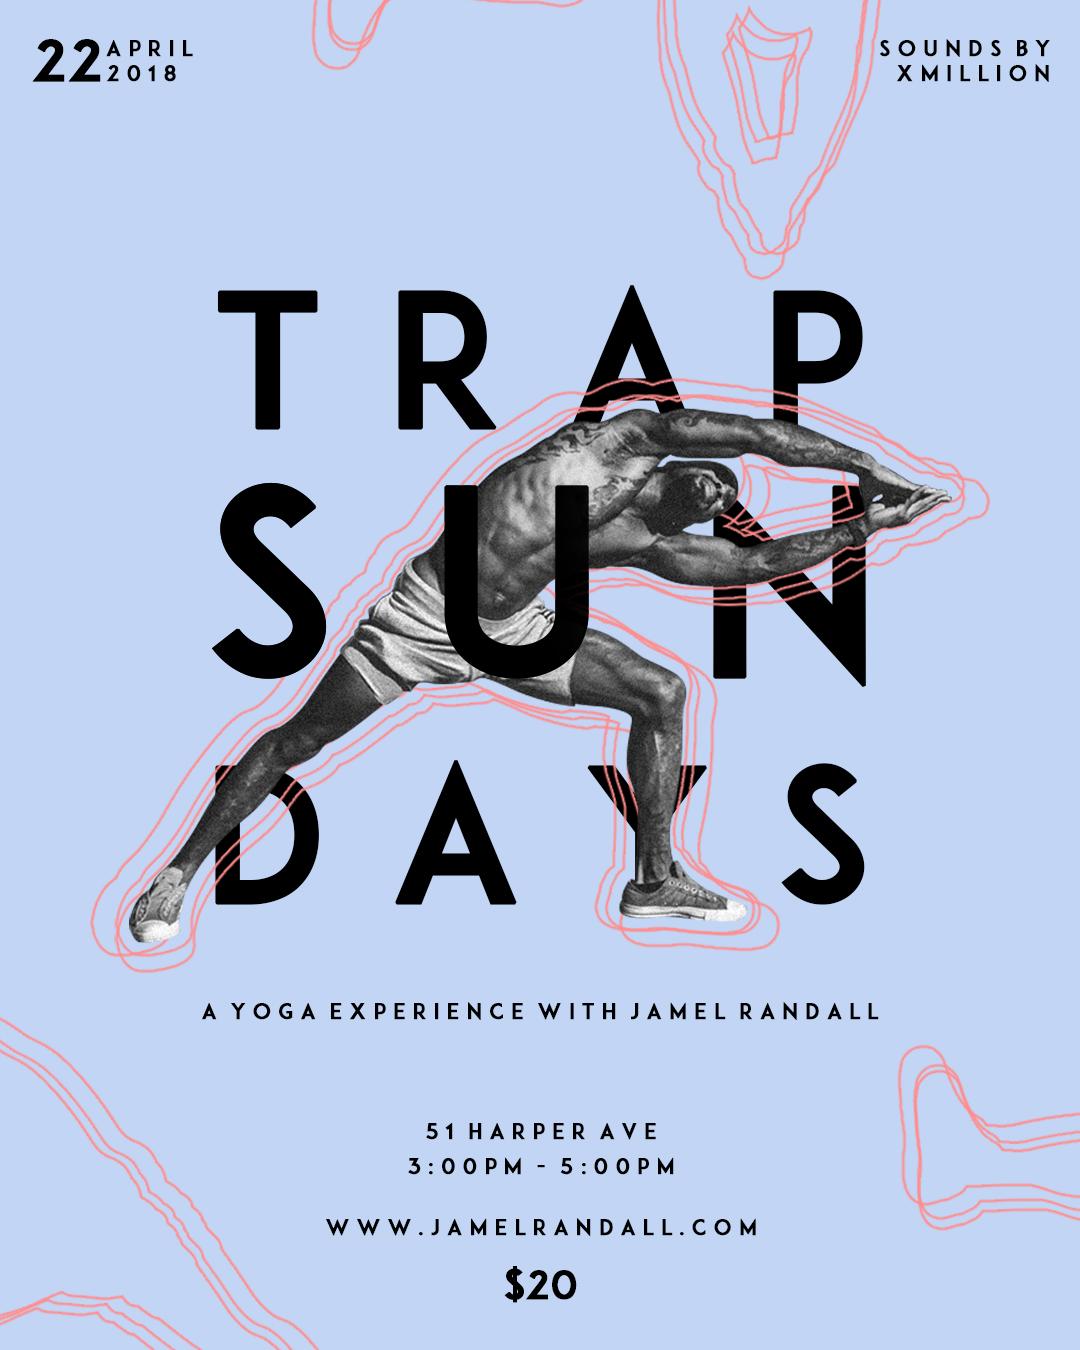 Jamel Randall The Trap Studio Trap Sundays Detroit